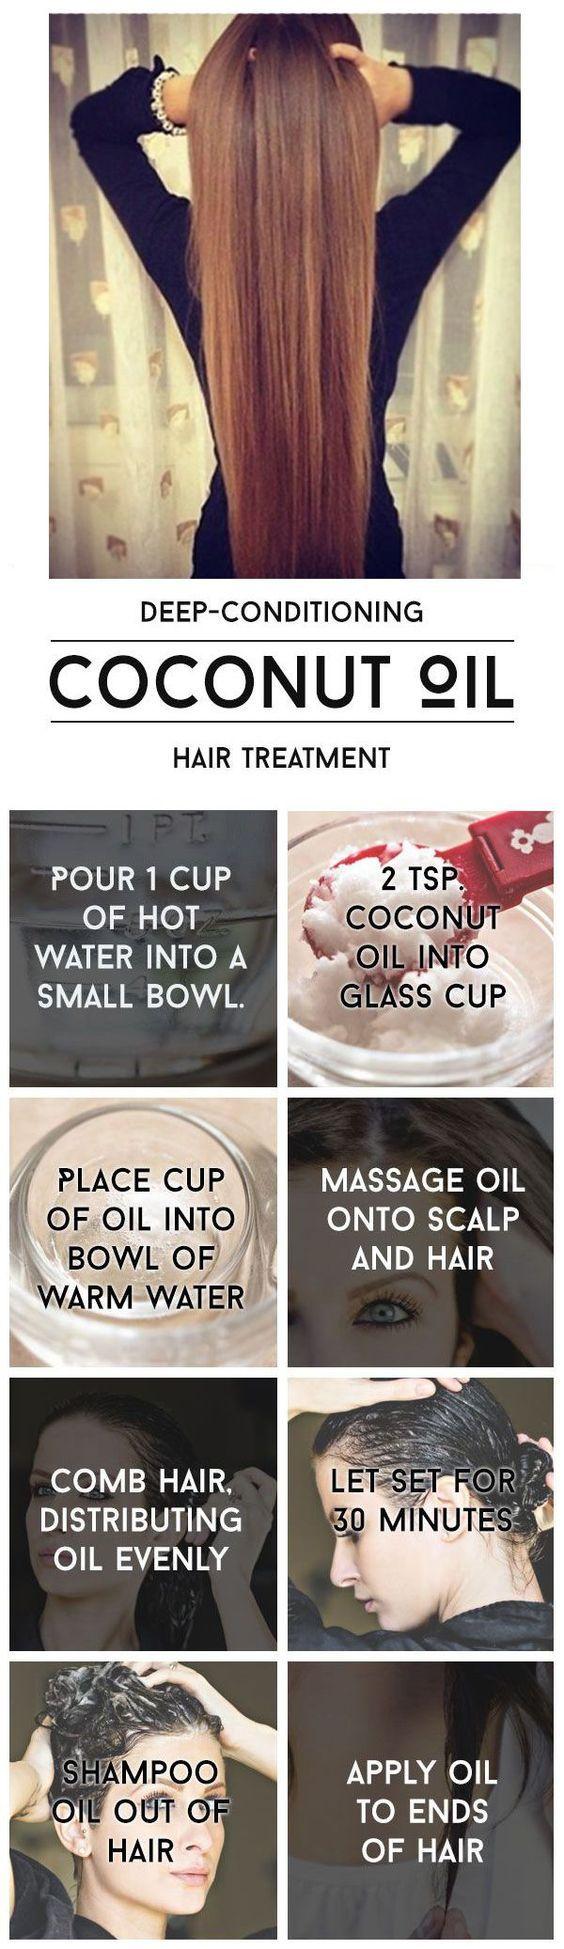 nice How to Grow Long Healthy Hair - Long Hair Growth Tips by http://www.dana-haircuts.xyz/natural-curly-hair/how-to-grow-long-healthy-hair-long-hair-growth-tips/